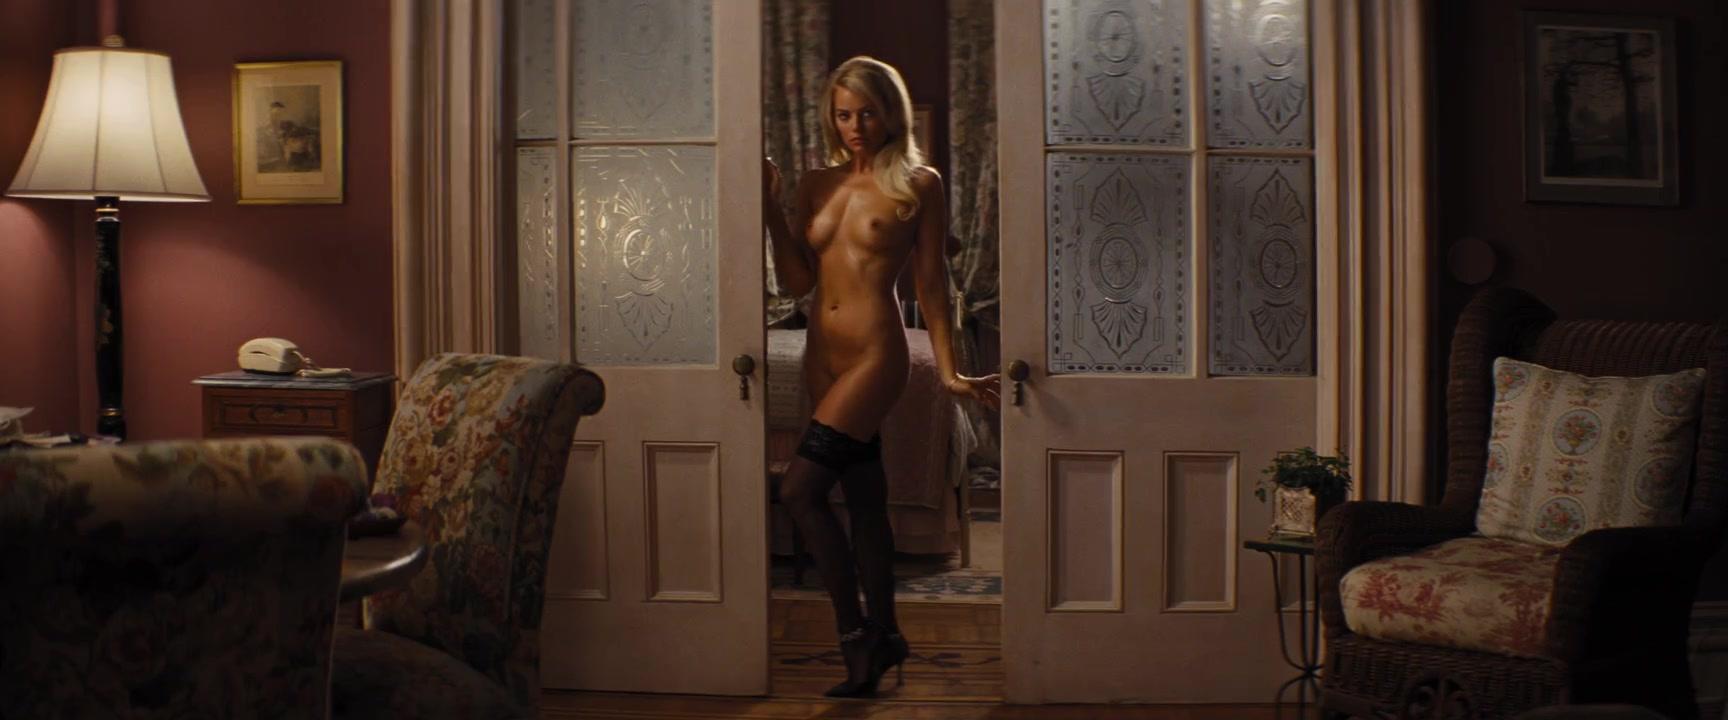 Margot robbie nude wolf of wall street spreading Margot Robbie Nude The Wolf Of Wall Street 2013